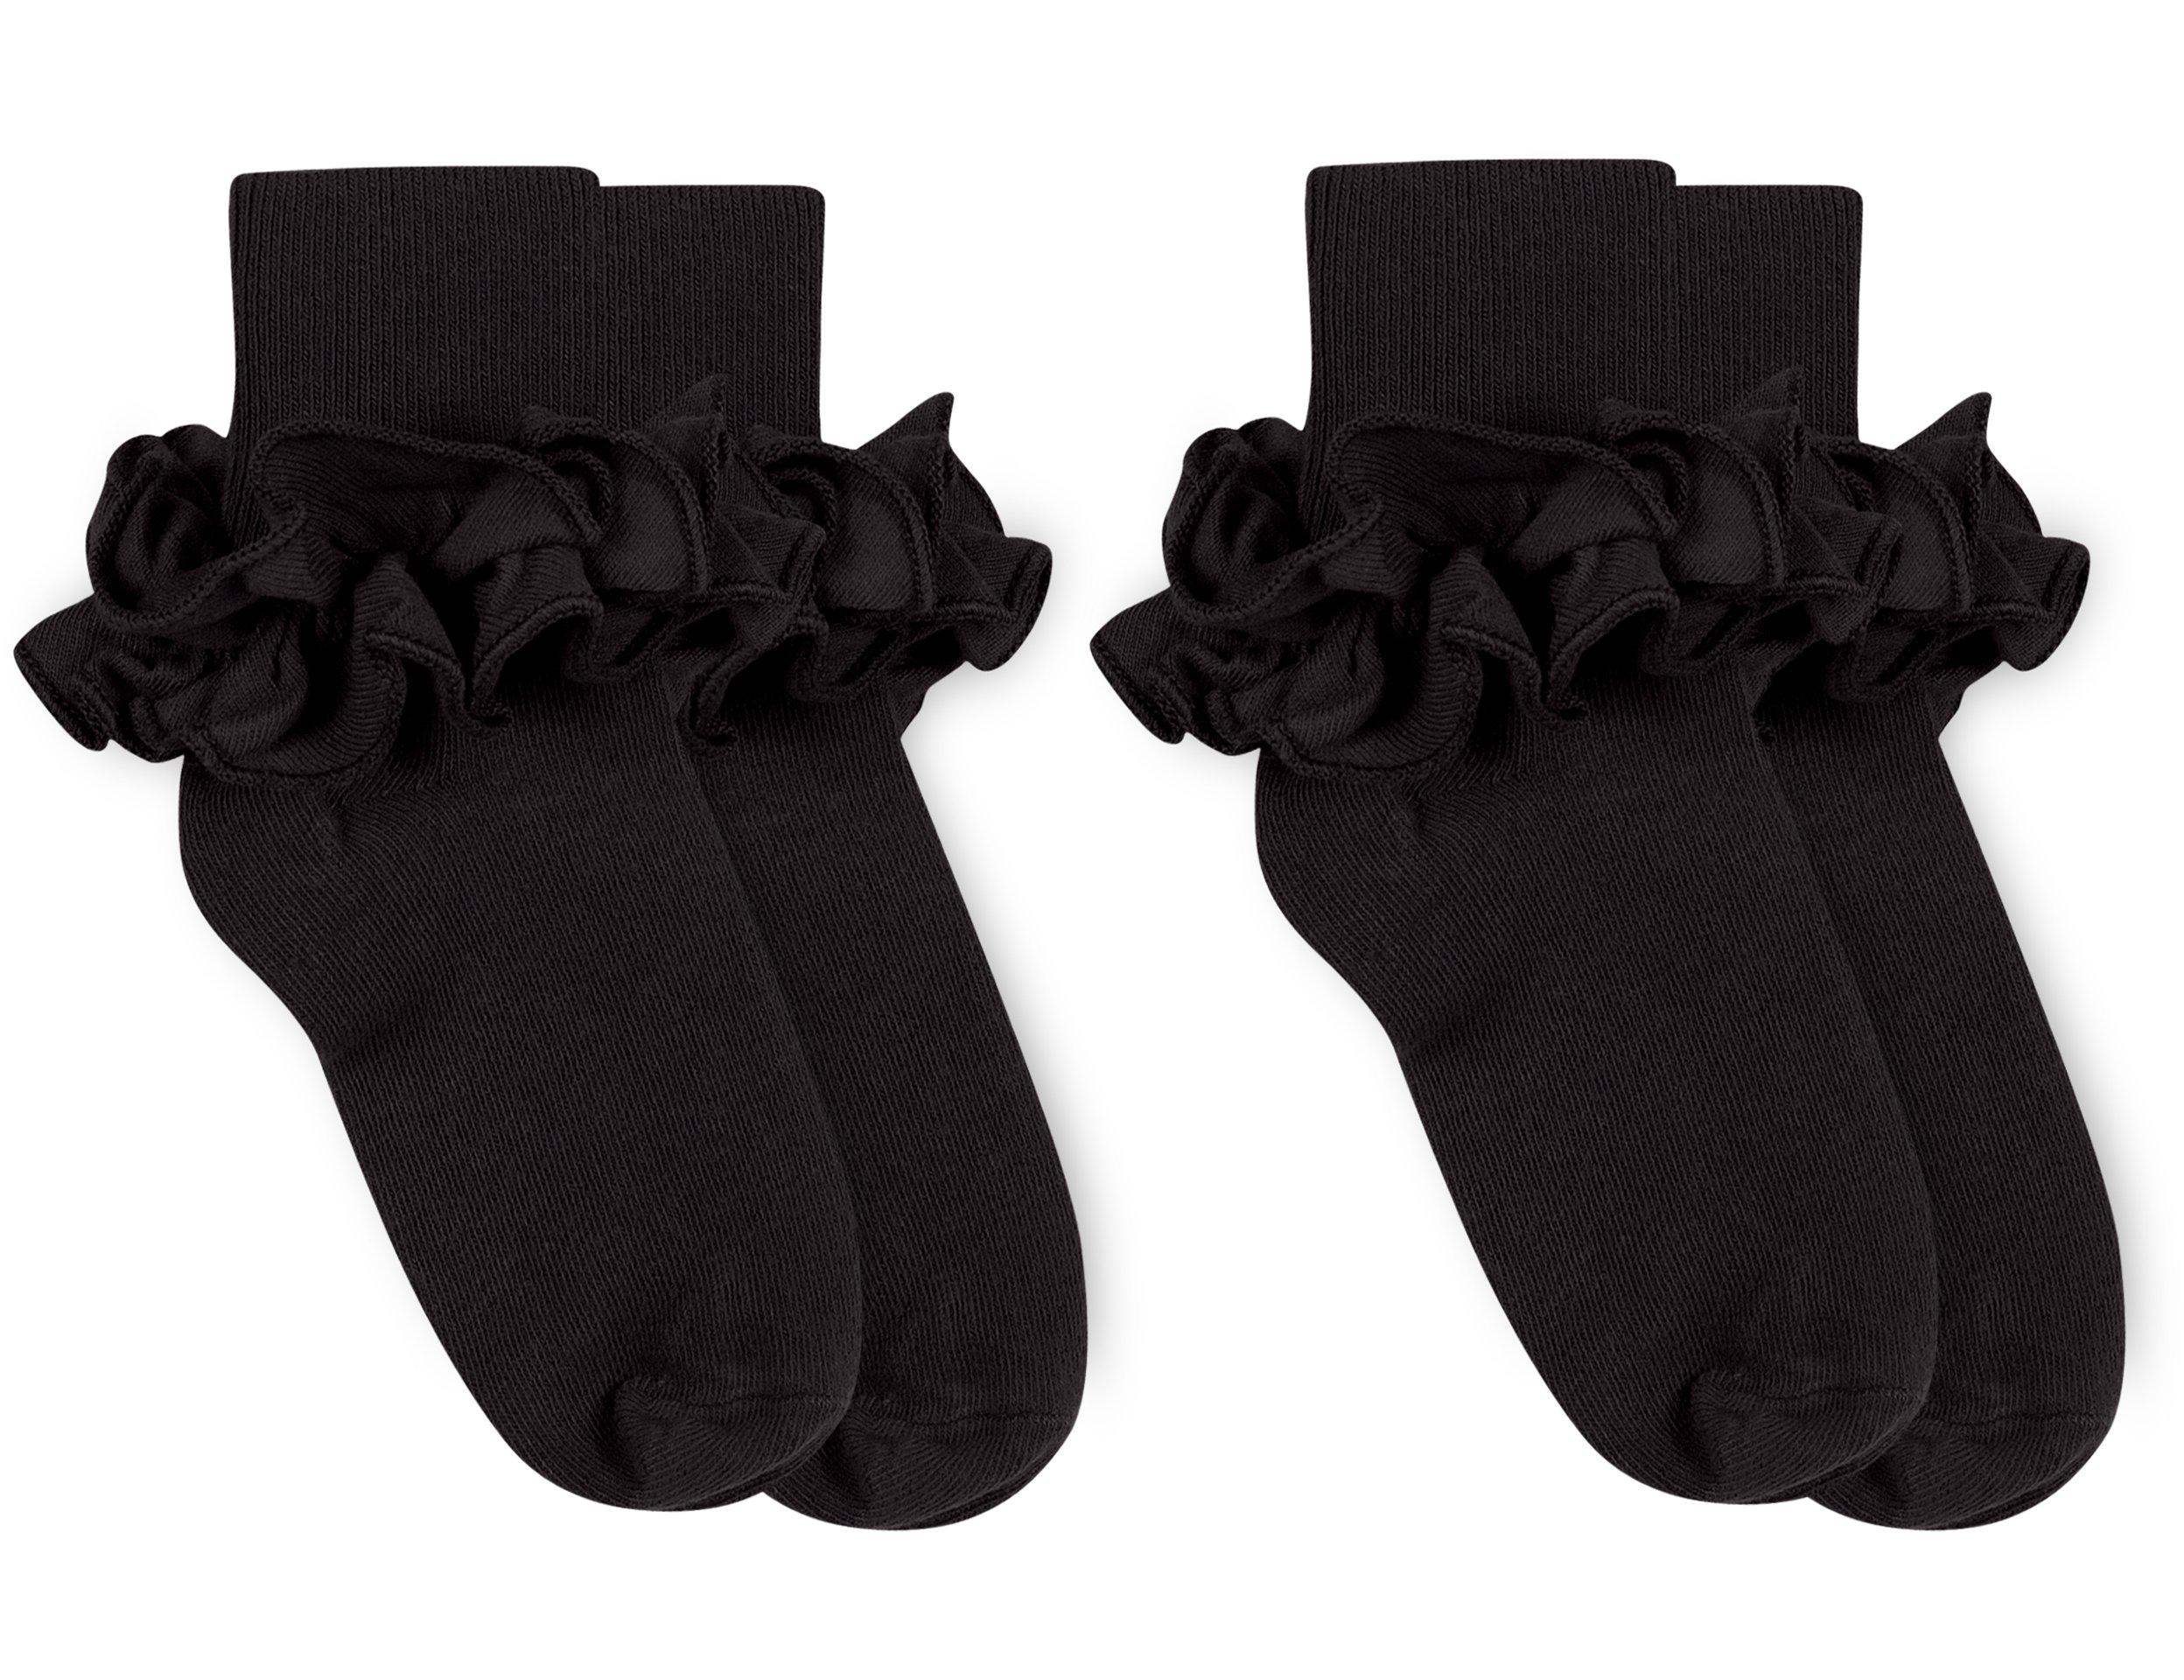 Jefferies Socks Girls Misty Ruffle Turn Cuff Socks 2 Pair Pack (Toddler - USA Shoe 3-7 - Age 1-2 Years, Black)